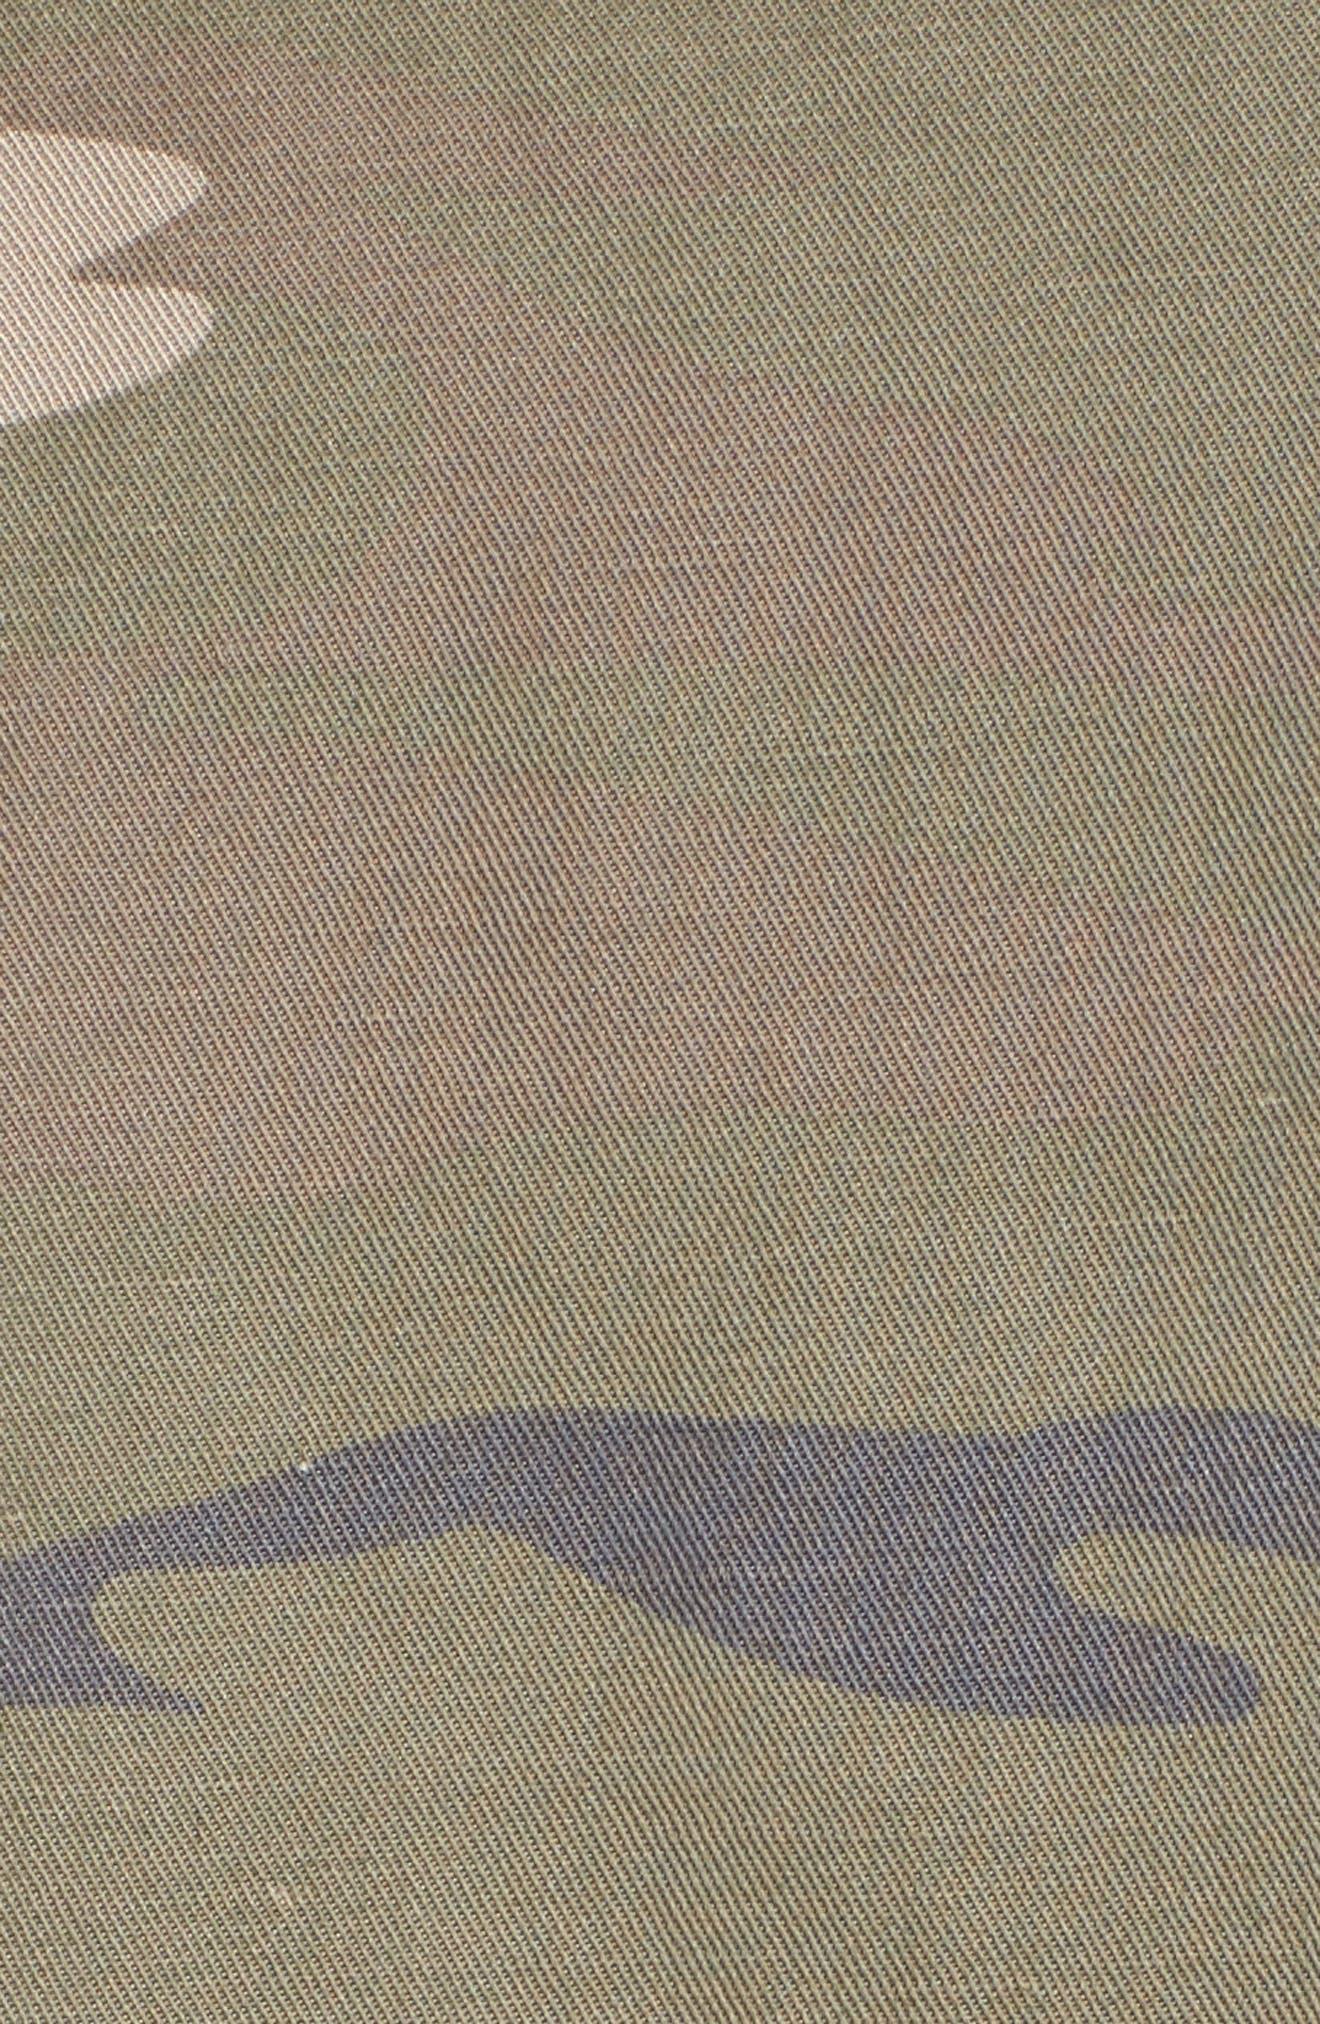 Maverick Camo Jacket,                             Alternate thumbnail 6, color,                             Sage Camo